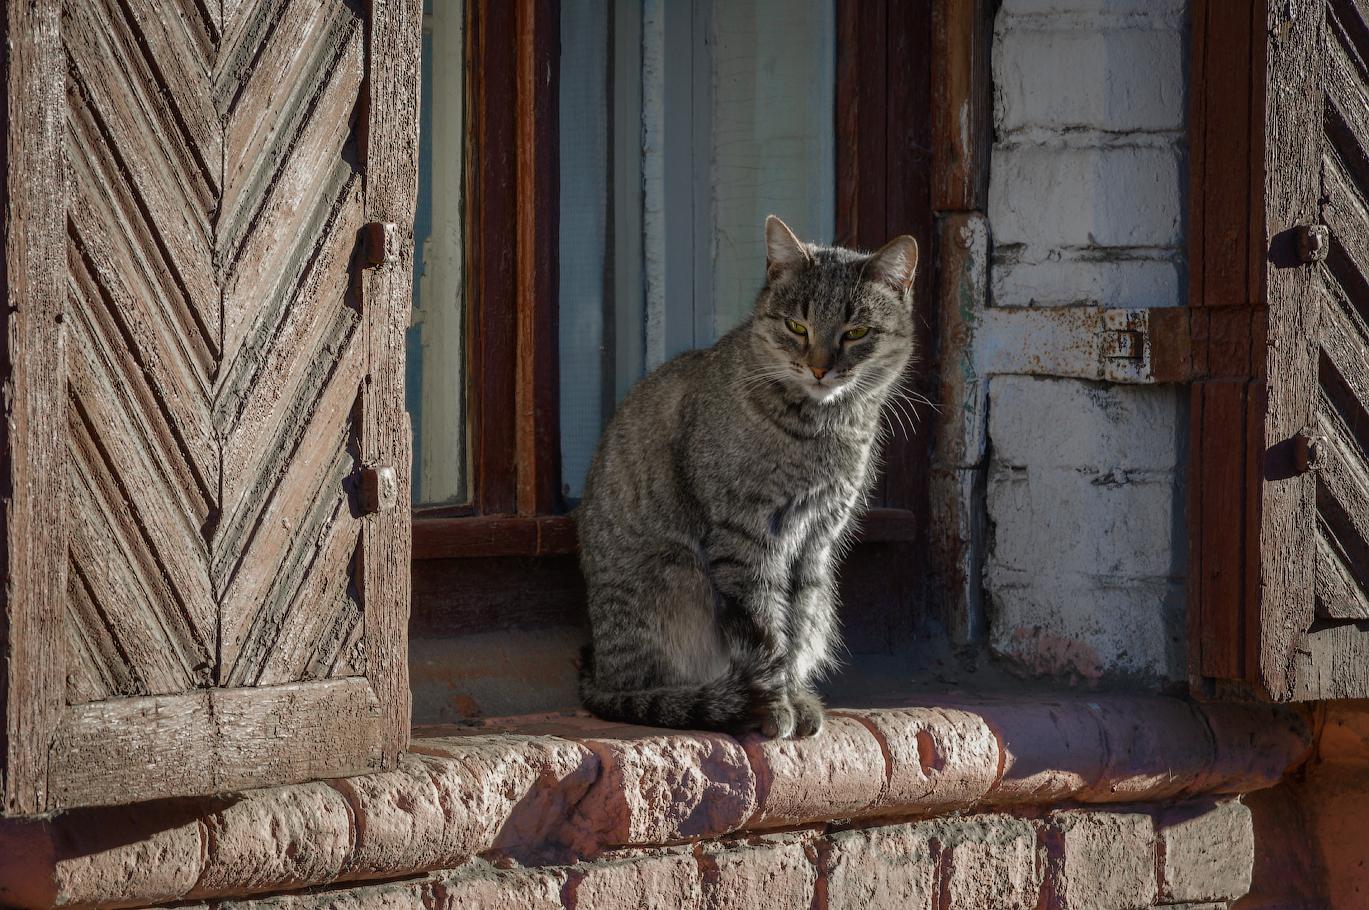 плагин котенок на крыльце картинки полагают, что козленка